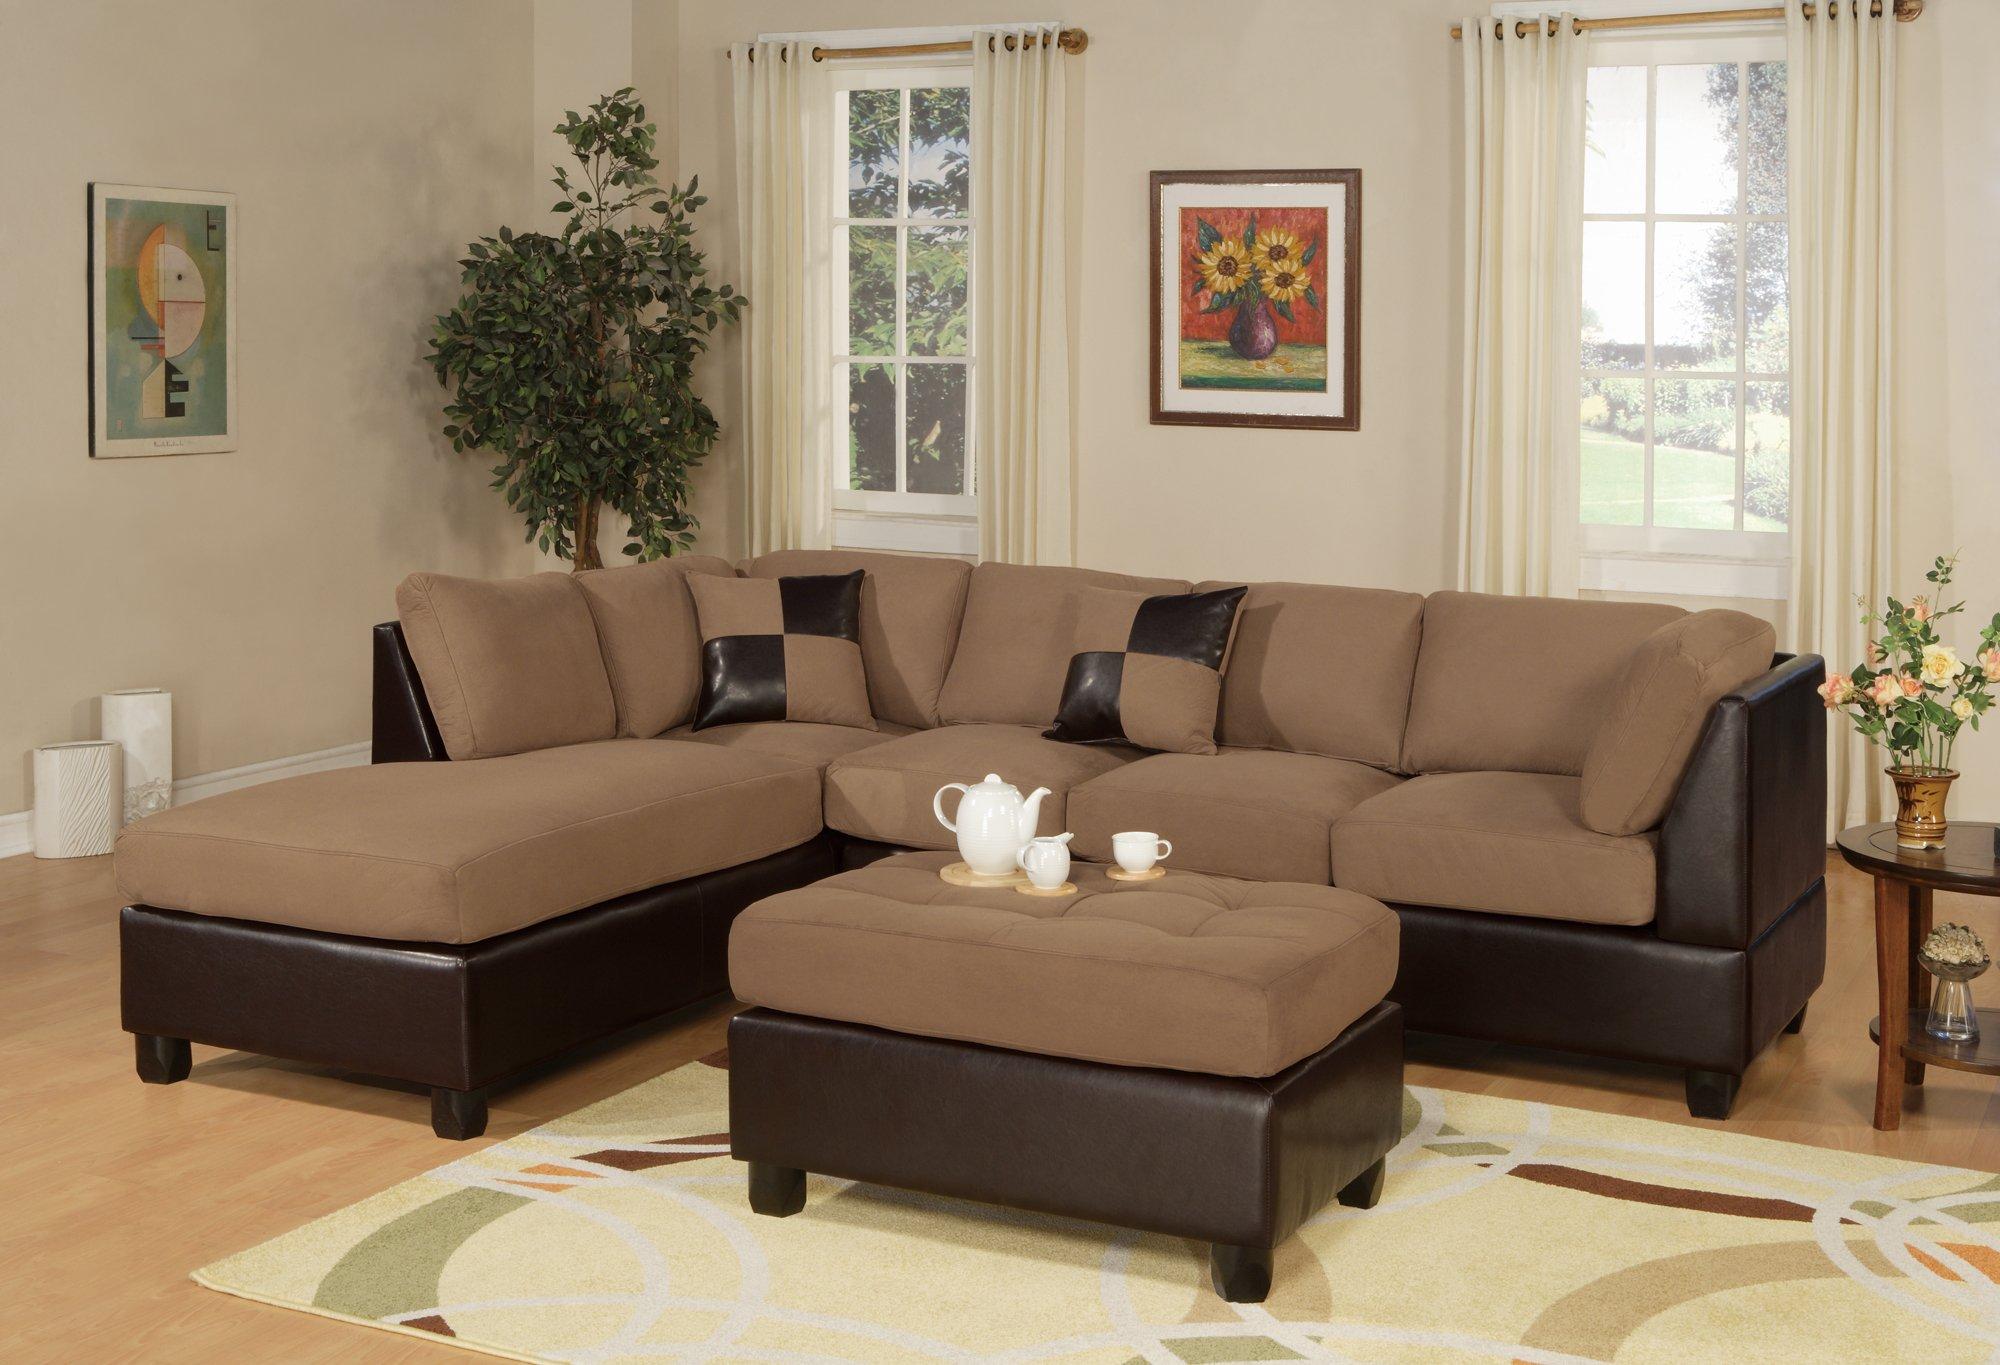 Bobkona Hungtinton MicrofiberFaux Leather 3Piece Sectional Sofa